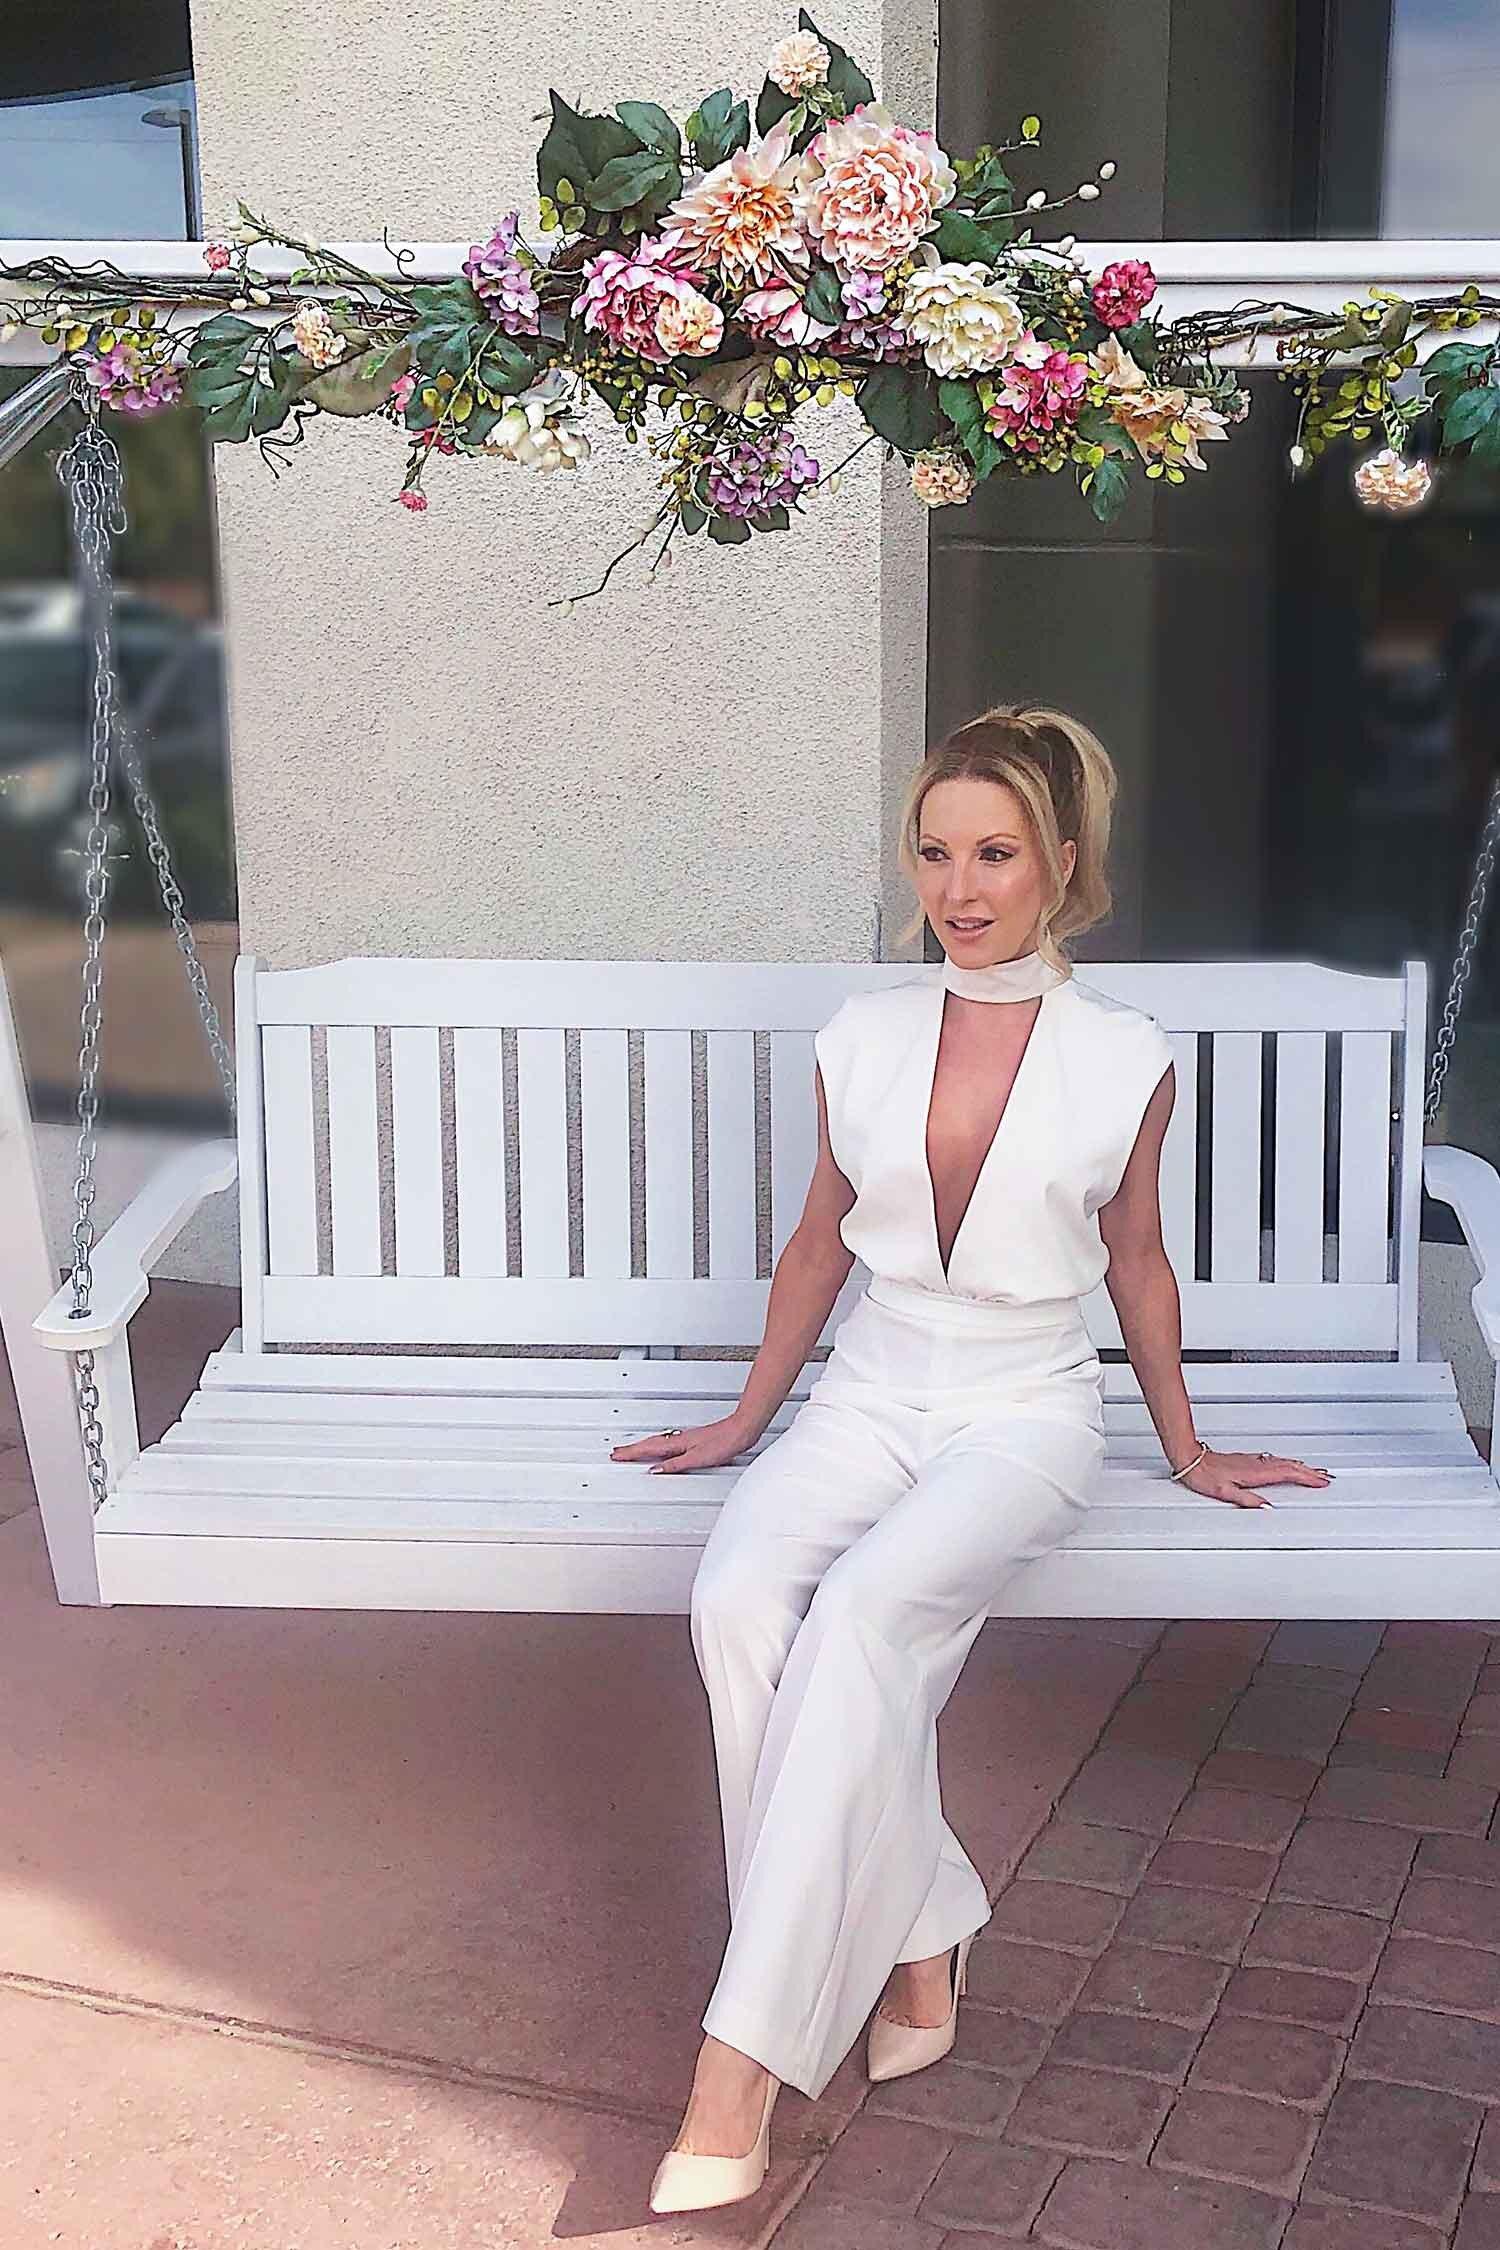 Las Vegas photo opp blogger Eve Dawes Cafe Lola swing white jump suit